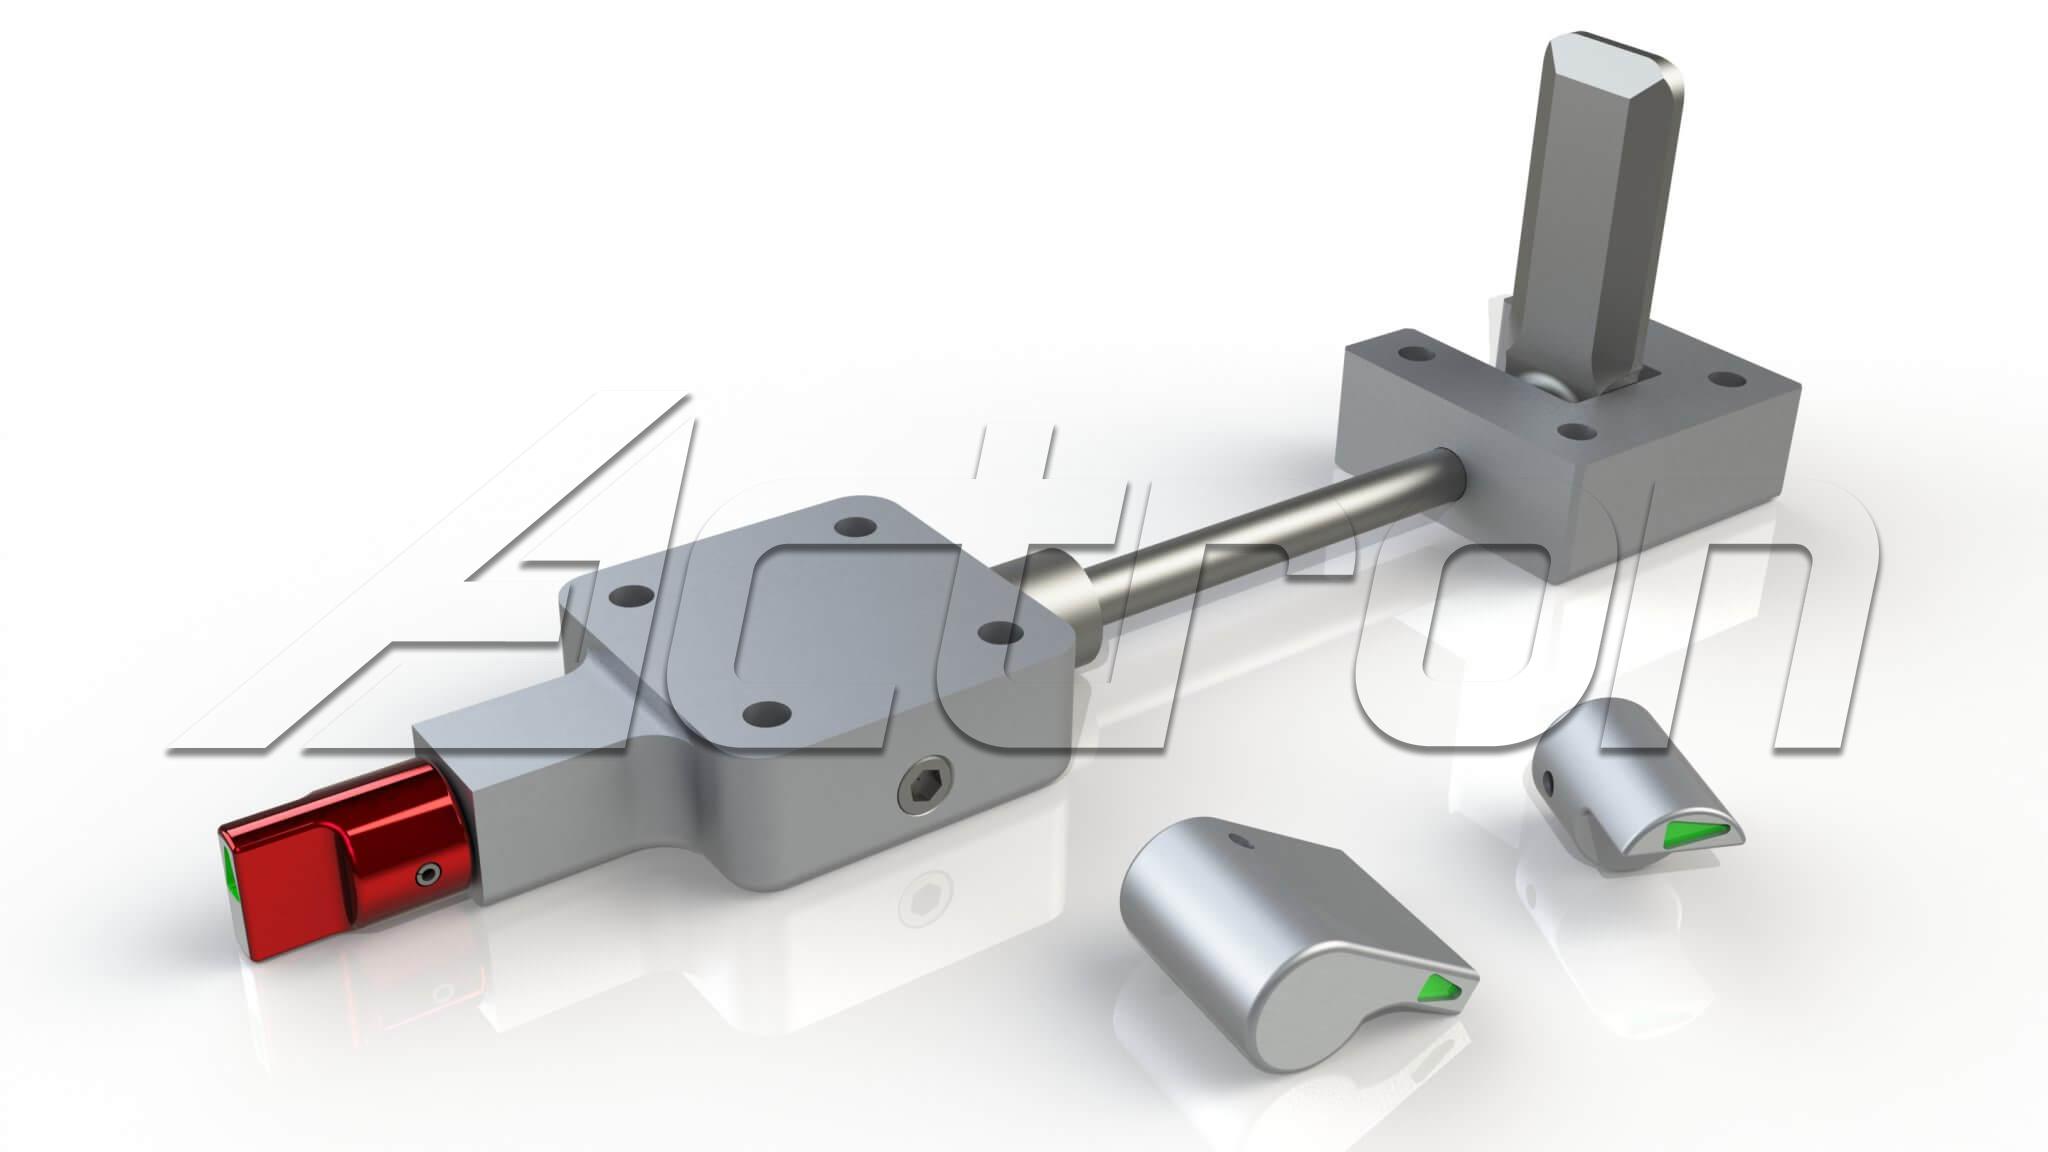 1-4-turn-retainer-4694-a35644.jpg